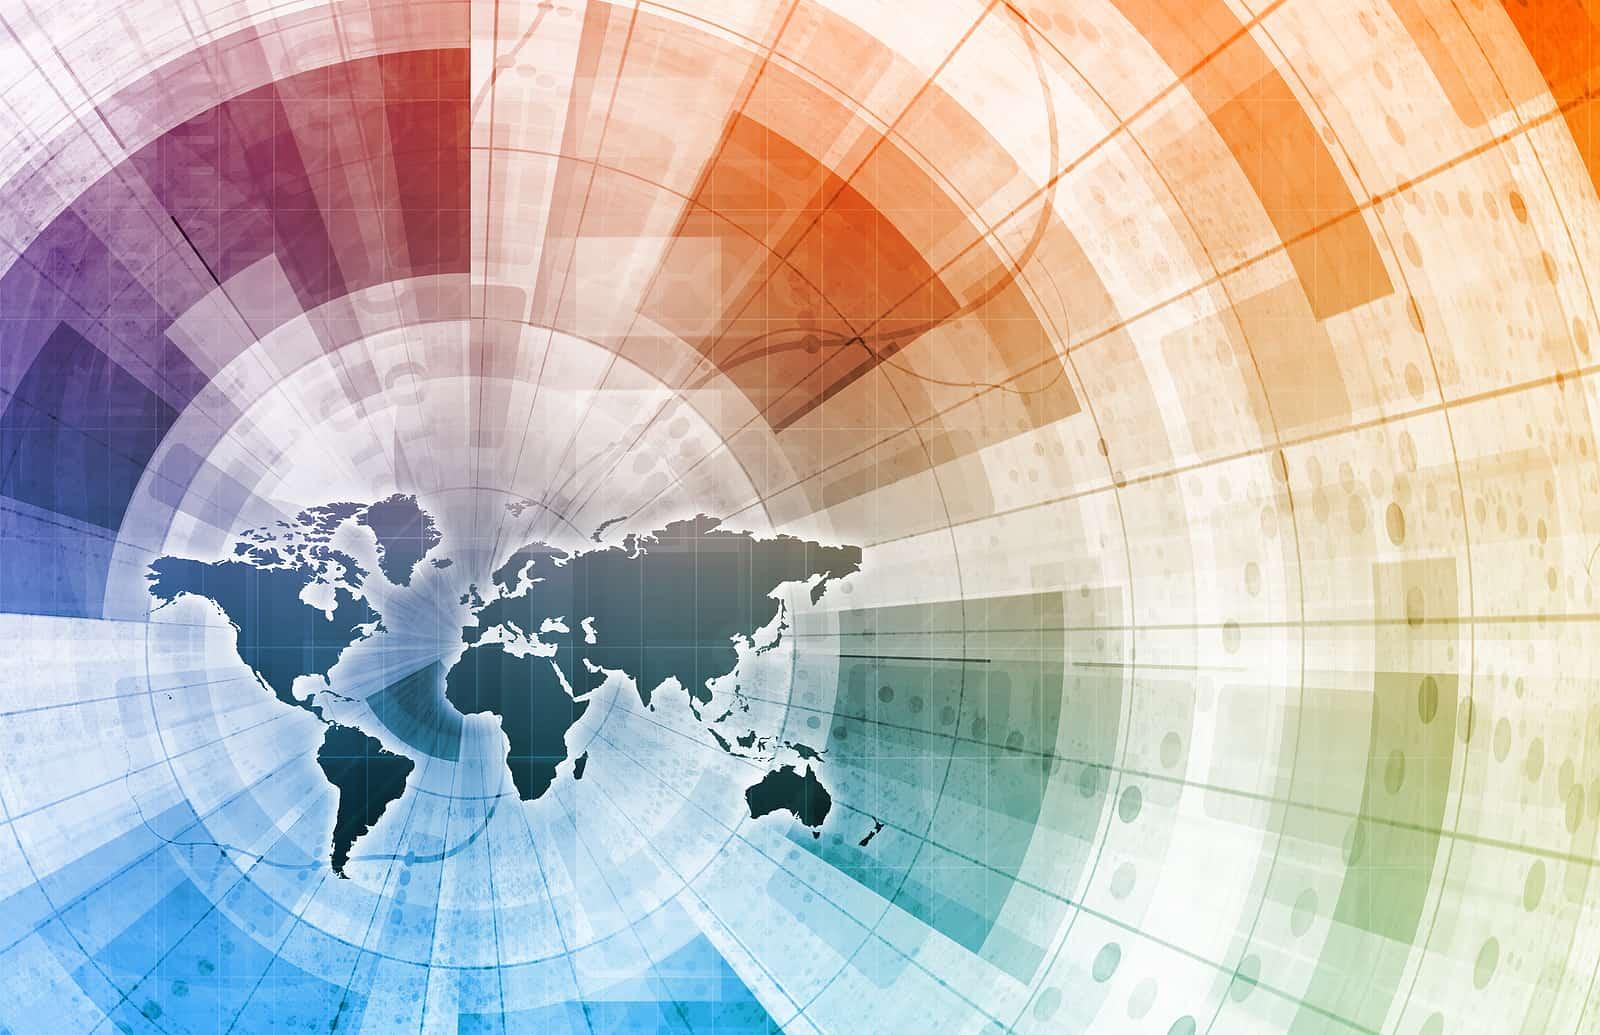 ESG No Longer Just a Buzzword as Regulation Creates Emerging Supply Chain Risk